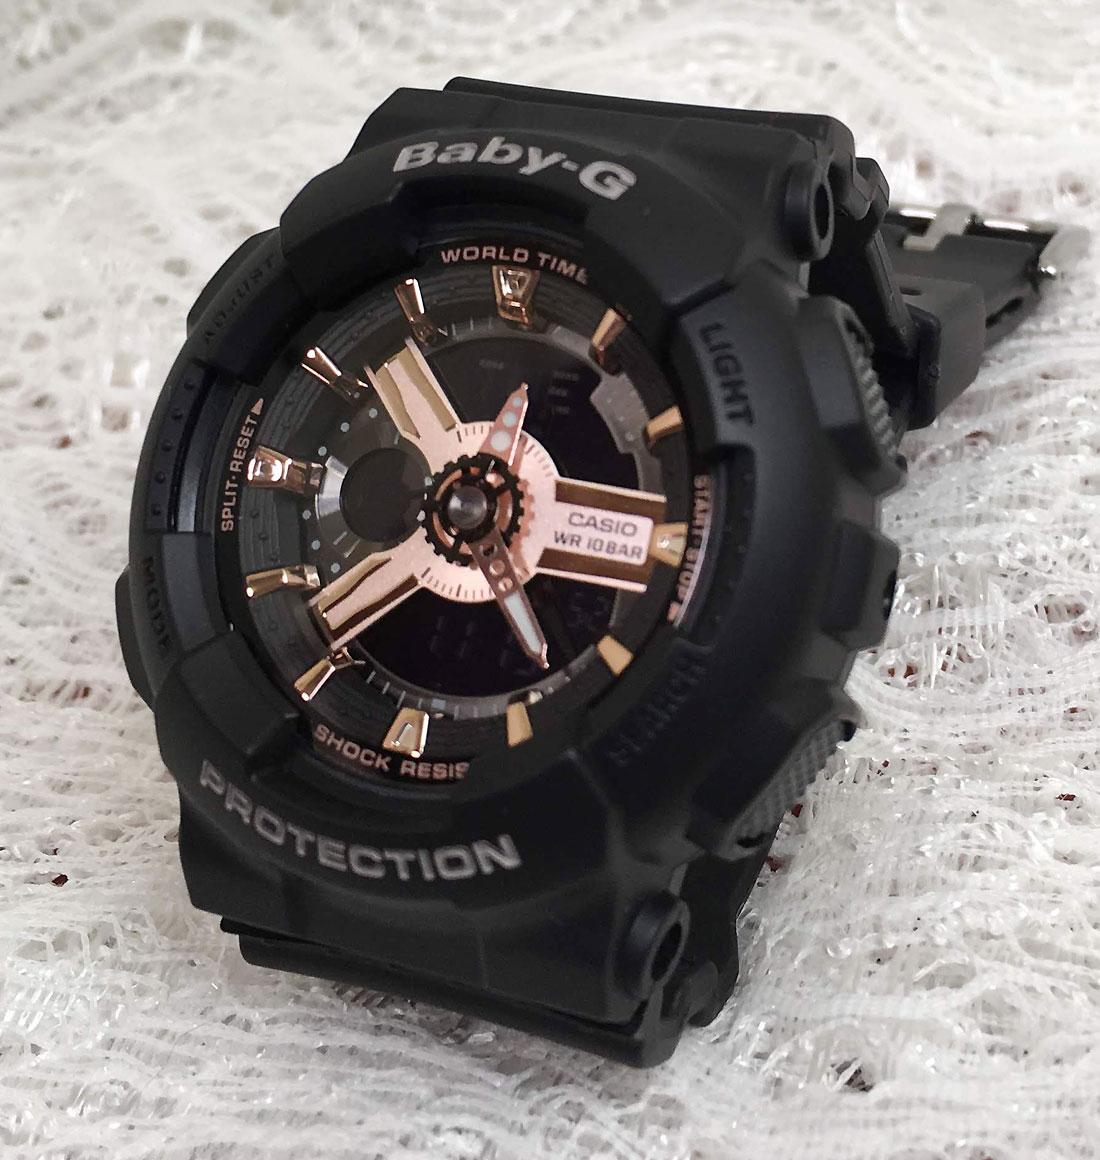 BABY-G カシオ BA-110RG-1AJF クオーツ プレゼント腕時計 ギフト 人気 ラッピング無料 愛の証 感謝の気持ち baby-g 国内正規品 新品 メッセージカード手書きします あす楽対応 クリスマスプレゼント